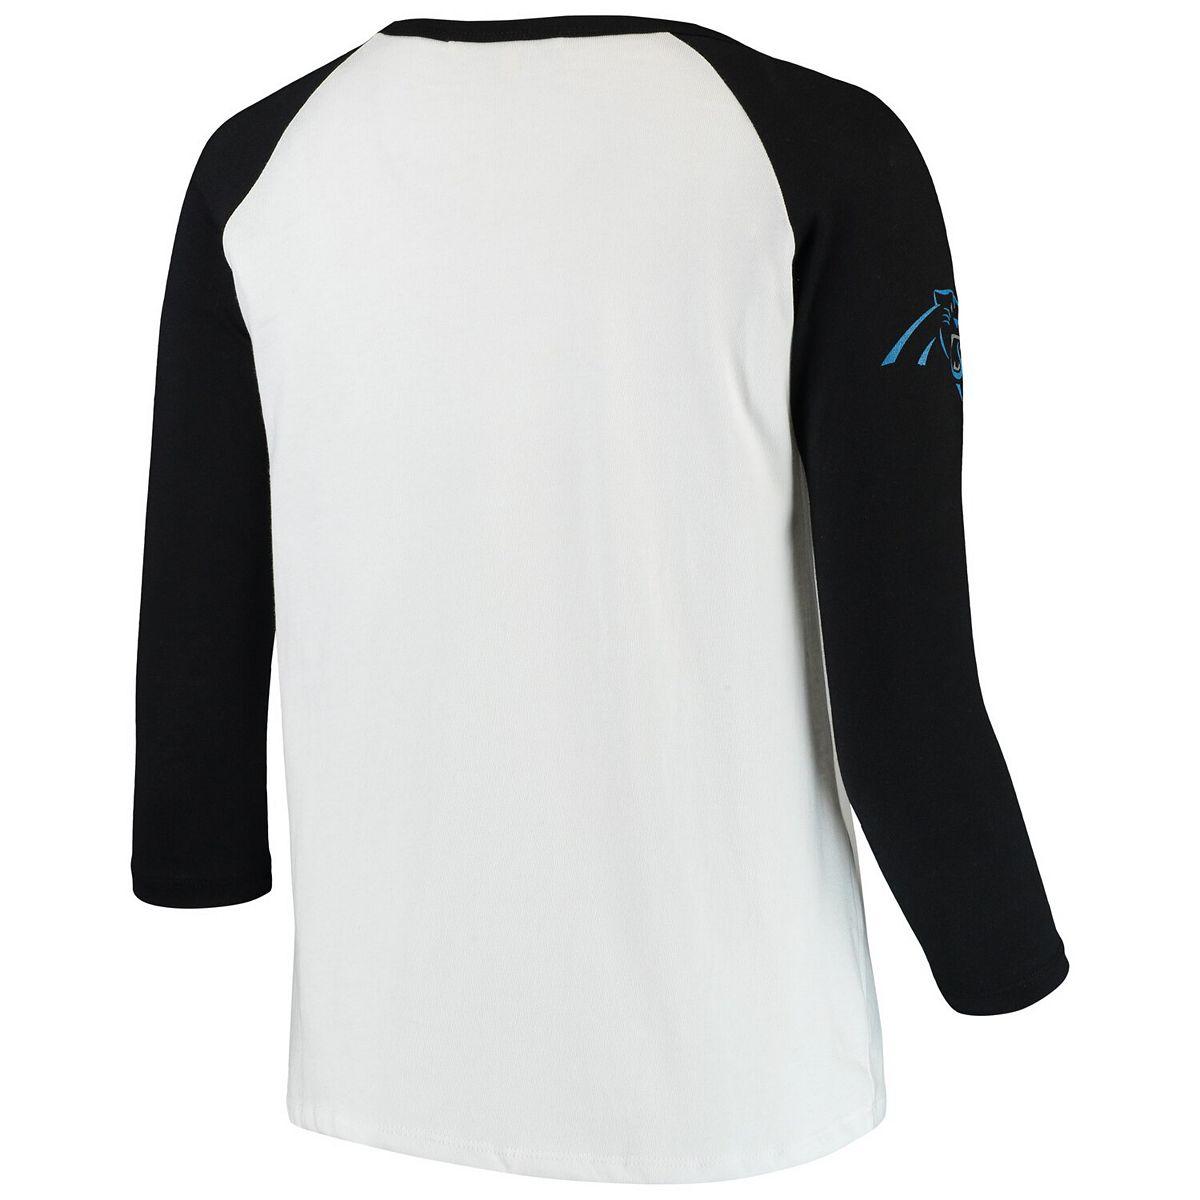 Women's Junk Food White/Black Carolina Panthers Retro Script Raglan 3/4-Sleeve T-Shirt A8hgw